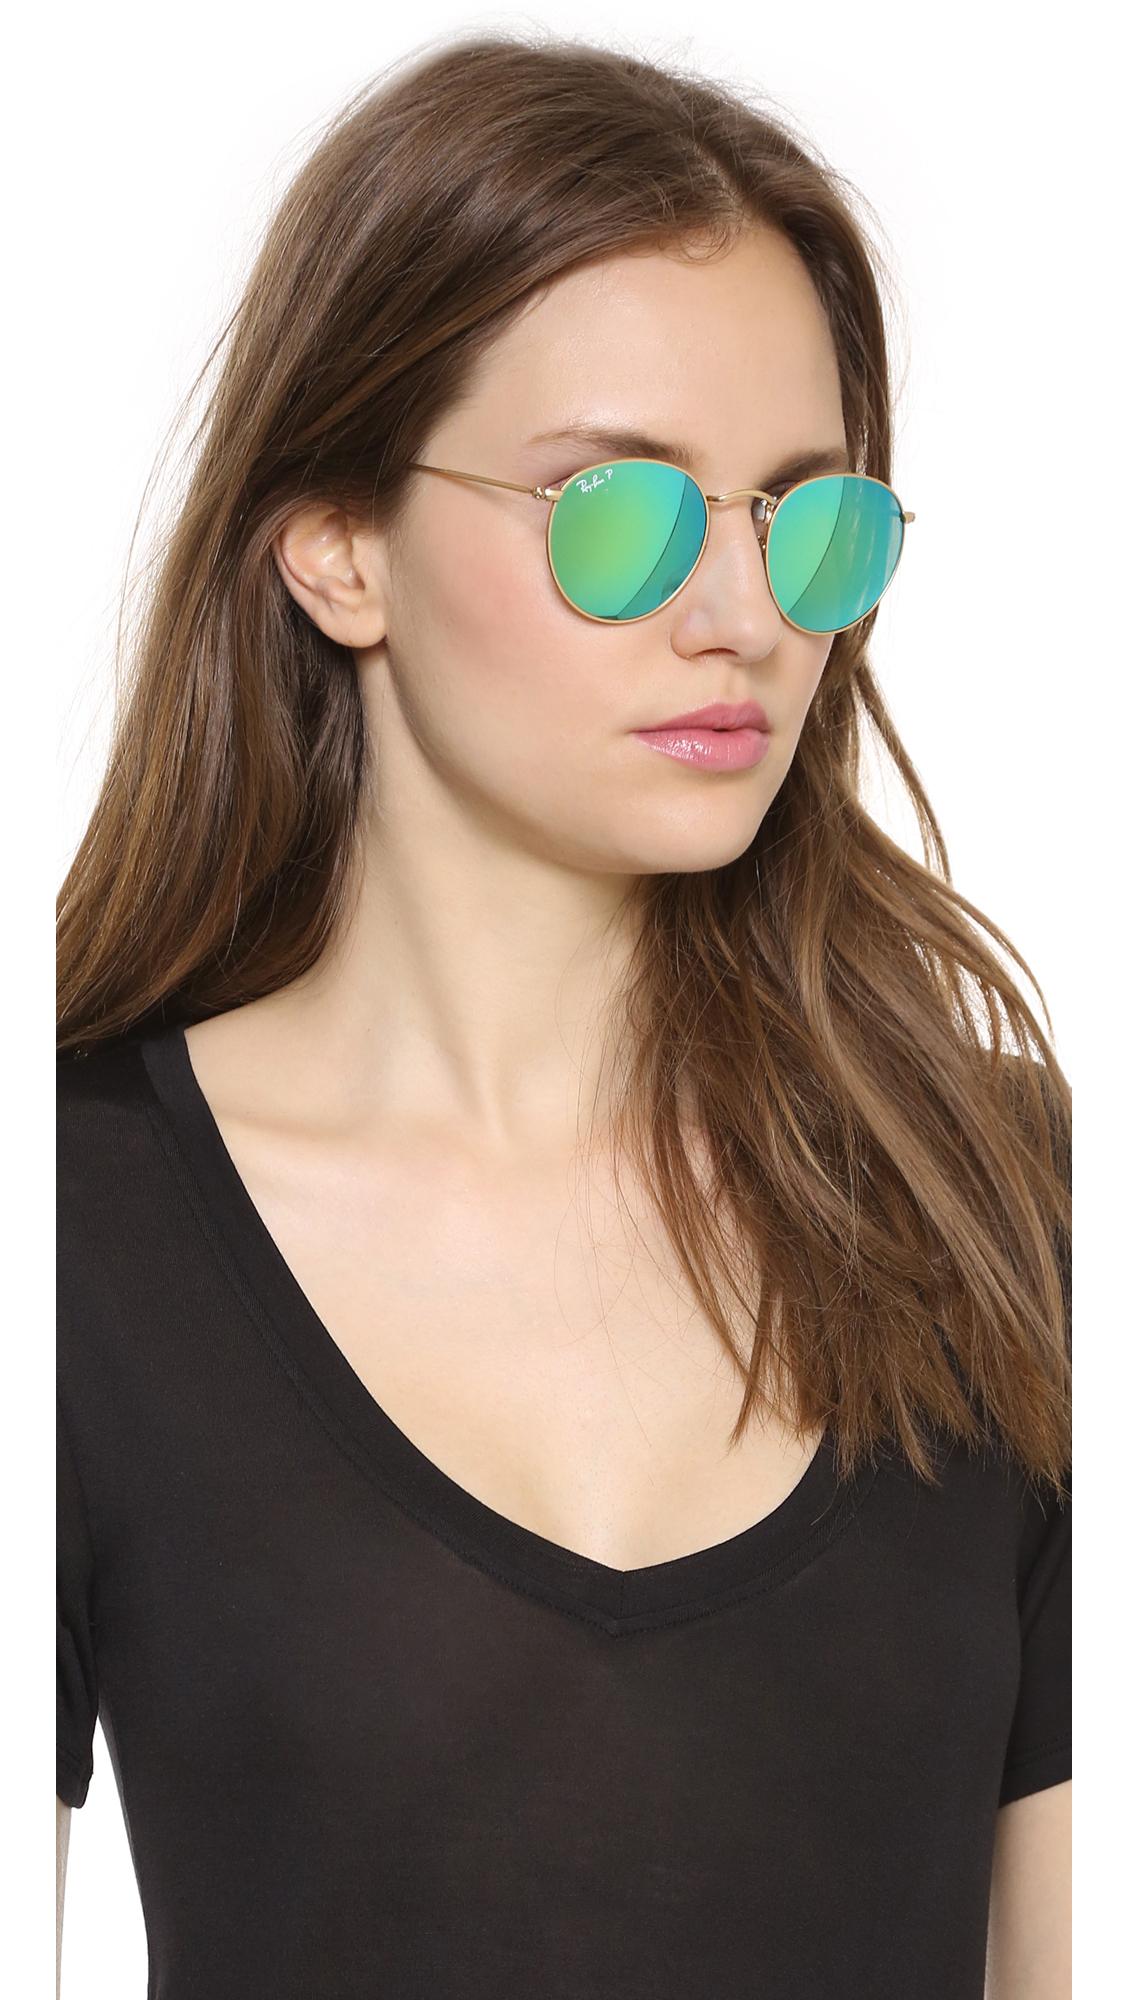 8b0504b1a Ray-Ban Mirrrored Polarized Icons Sunglasses - Matte Gold/Green ...